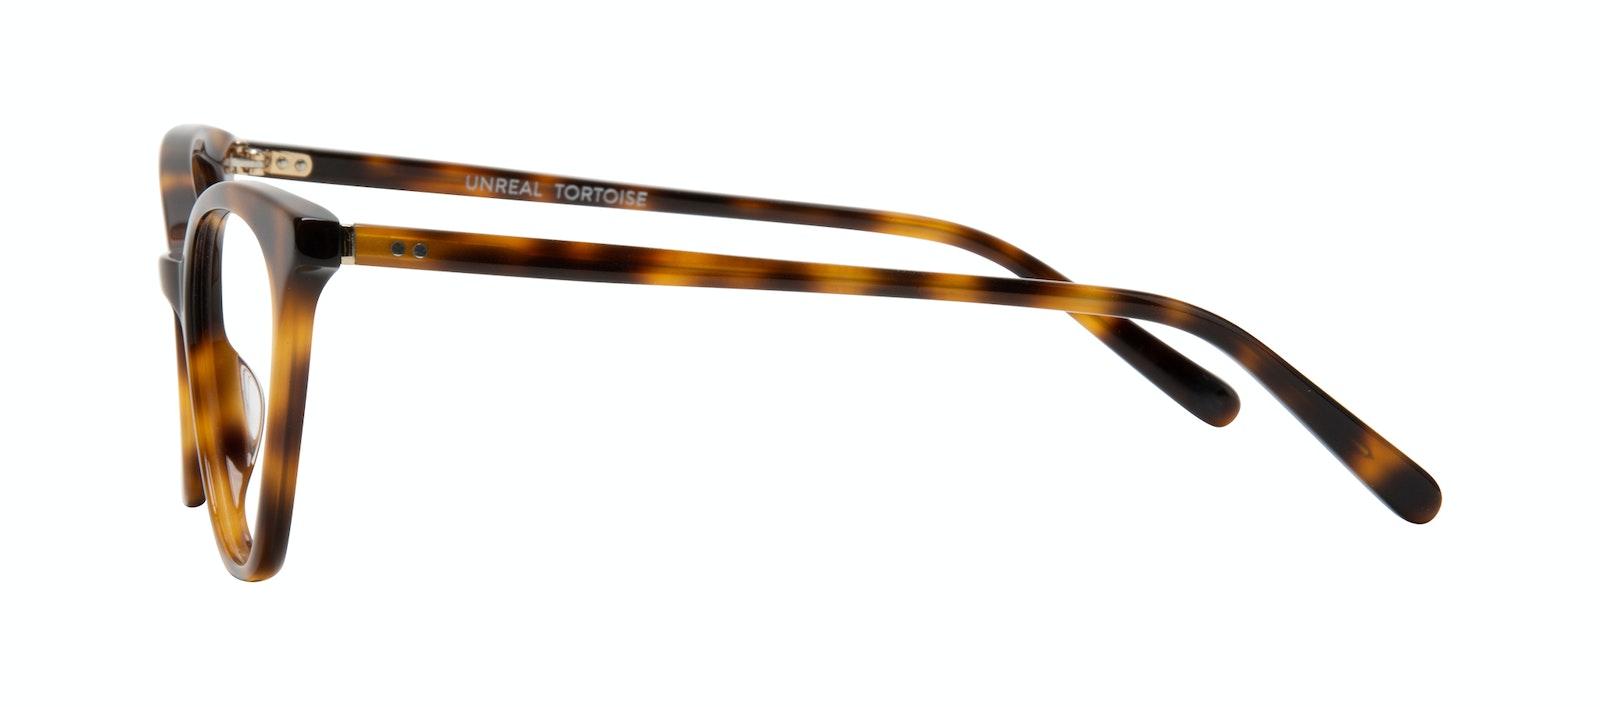 Affordable Fashion Glasses Cat Eye Eyeglasses Women Unreal Tortoise Side